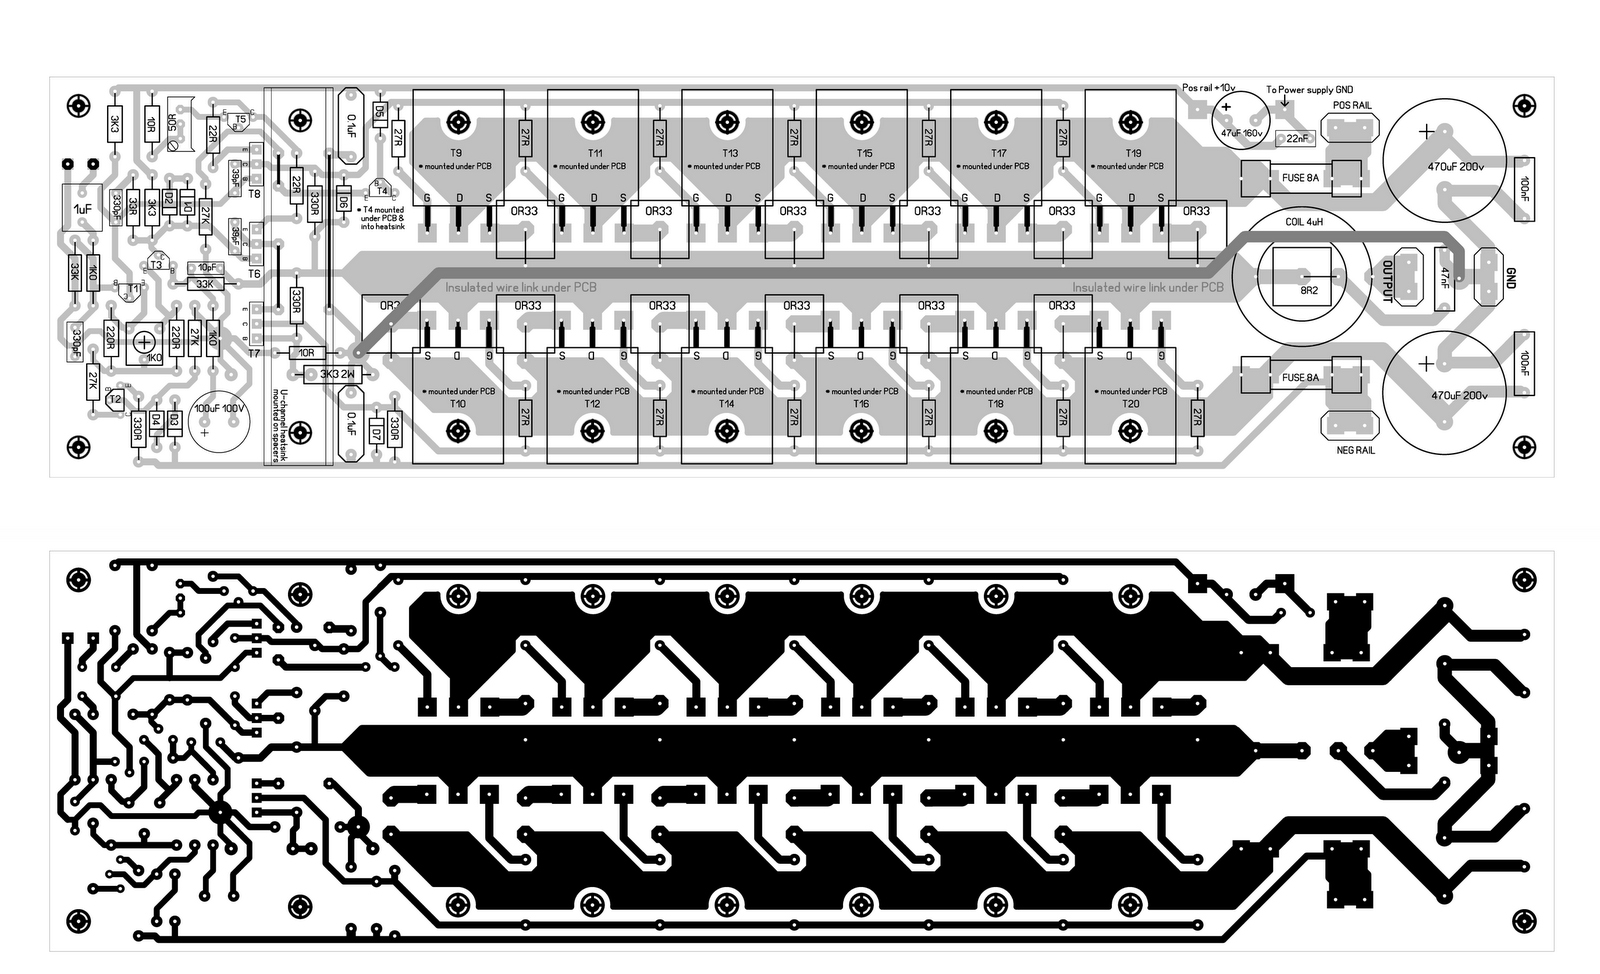 hight resolution of 800watt subwoofer amplifier circuit diagram